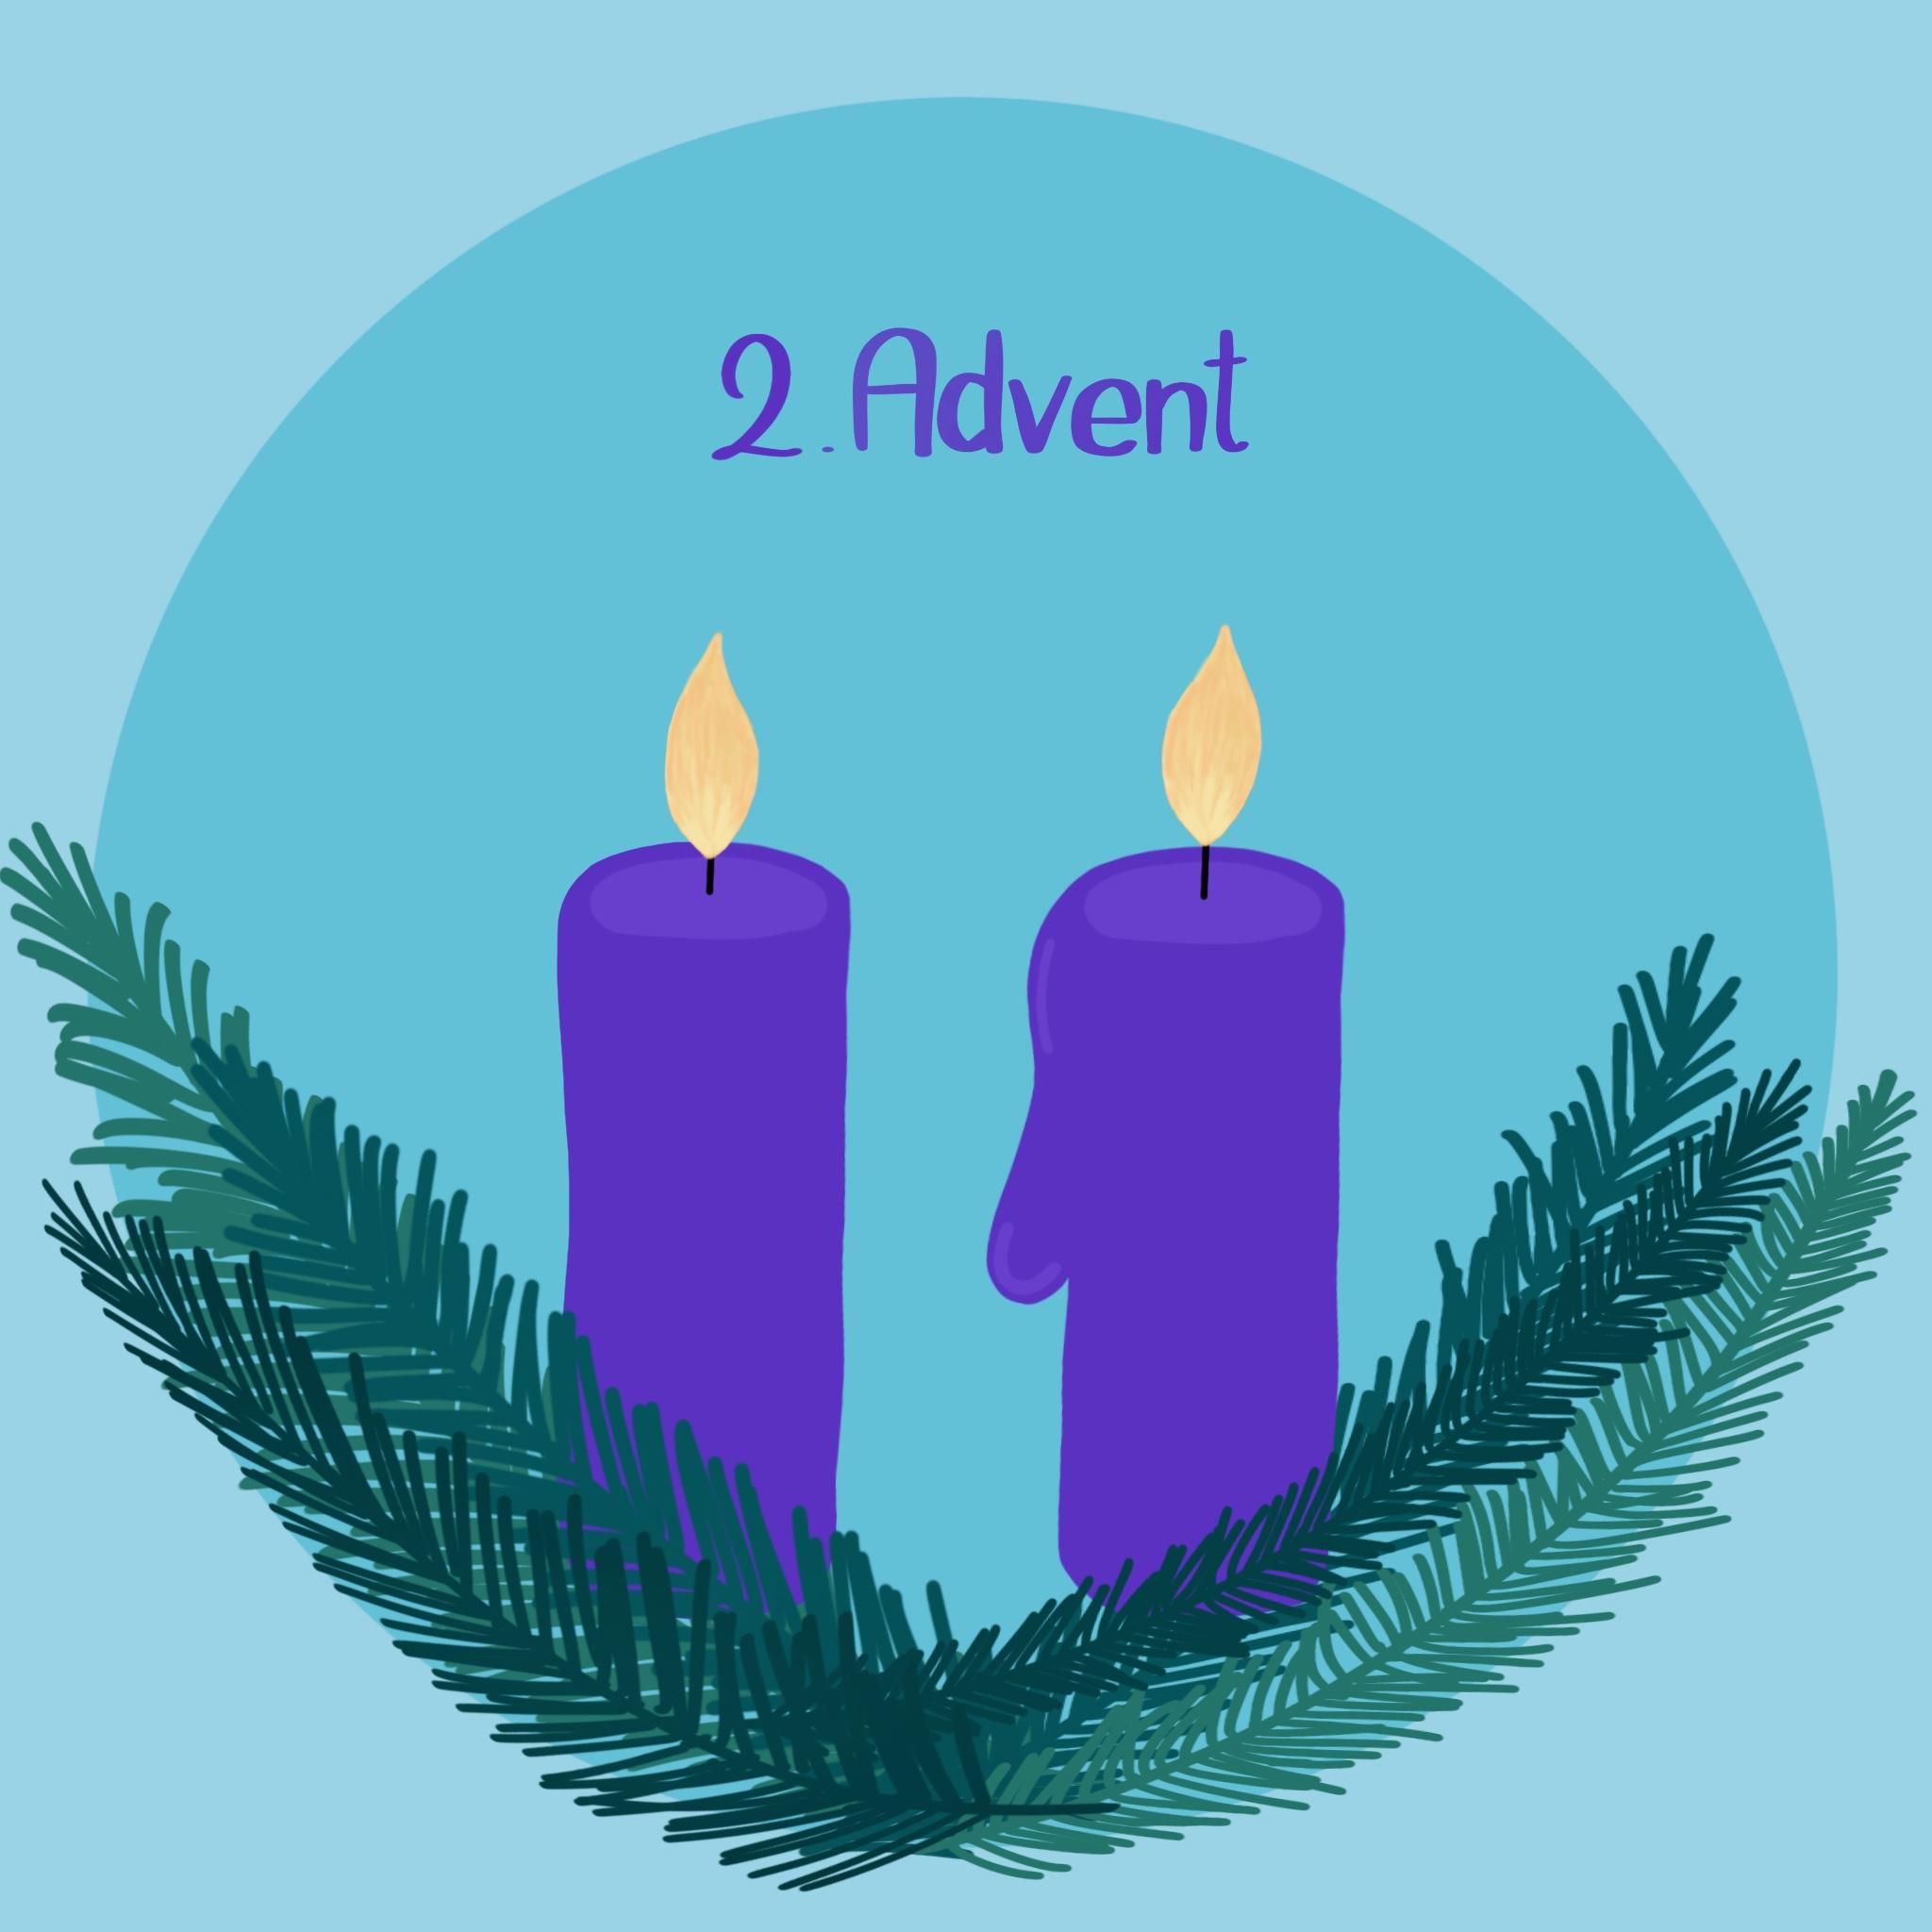 Adventskalender 6.12.2020